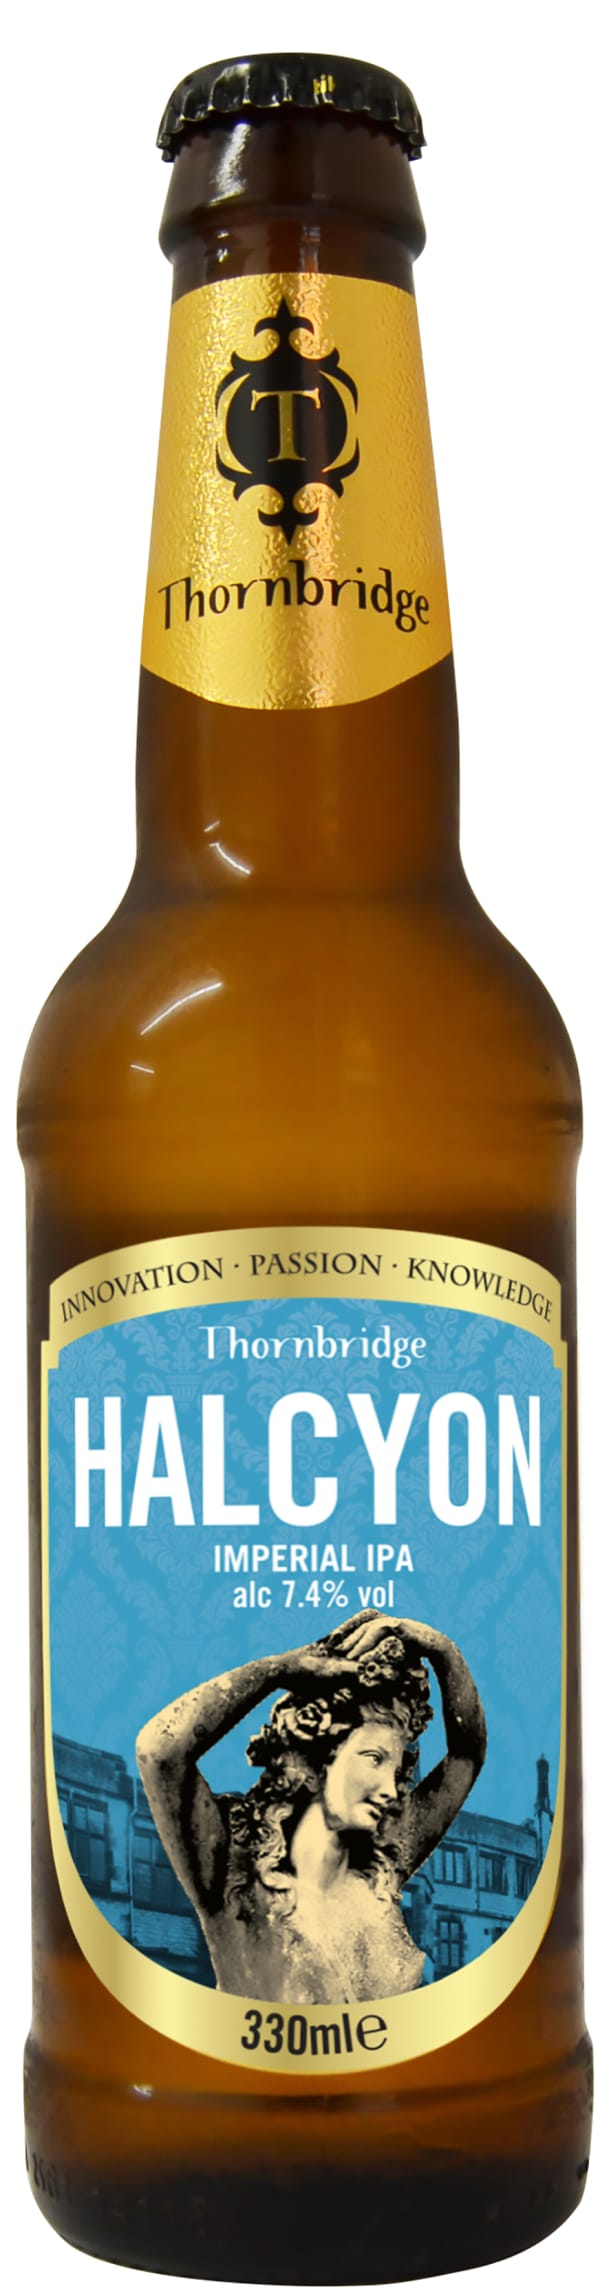 Thornbridge Halcyon Imperial IPA